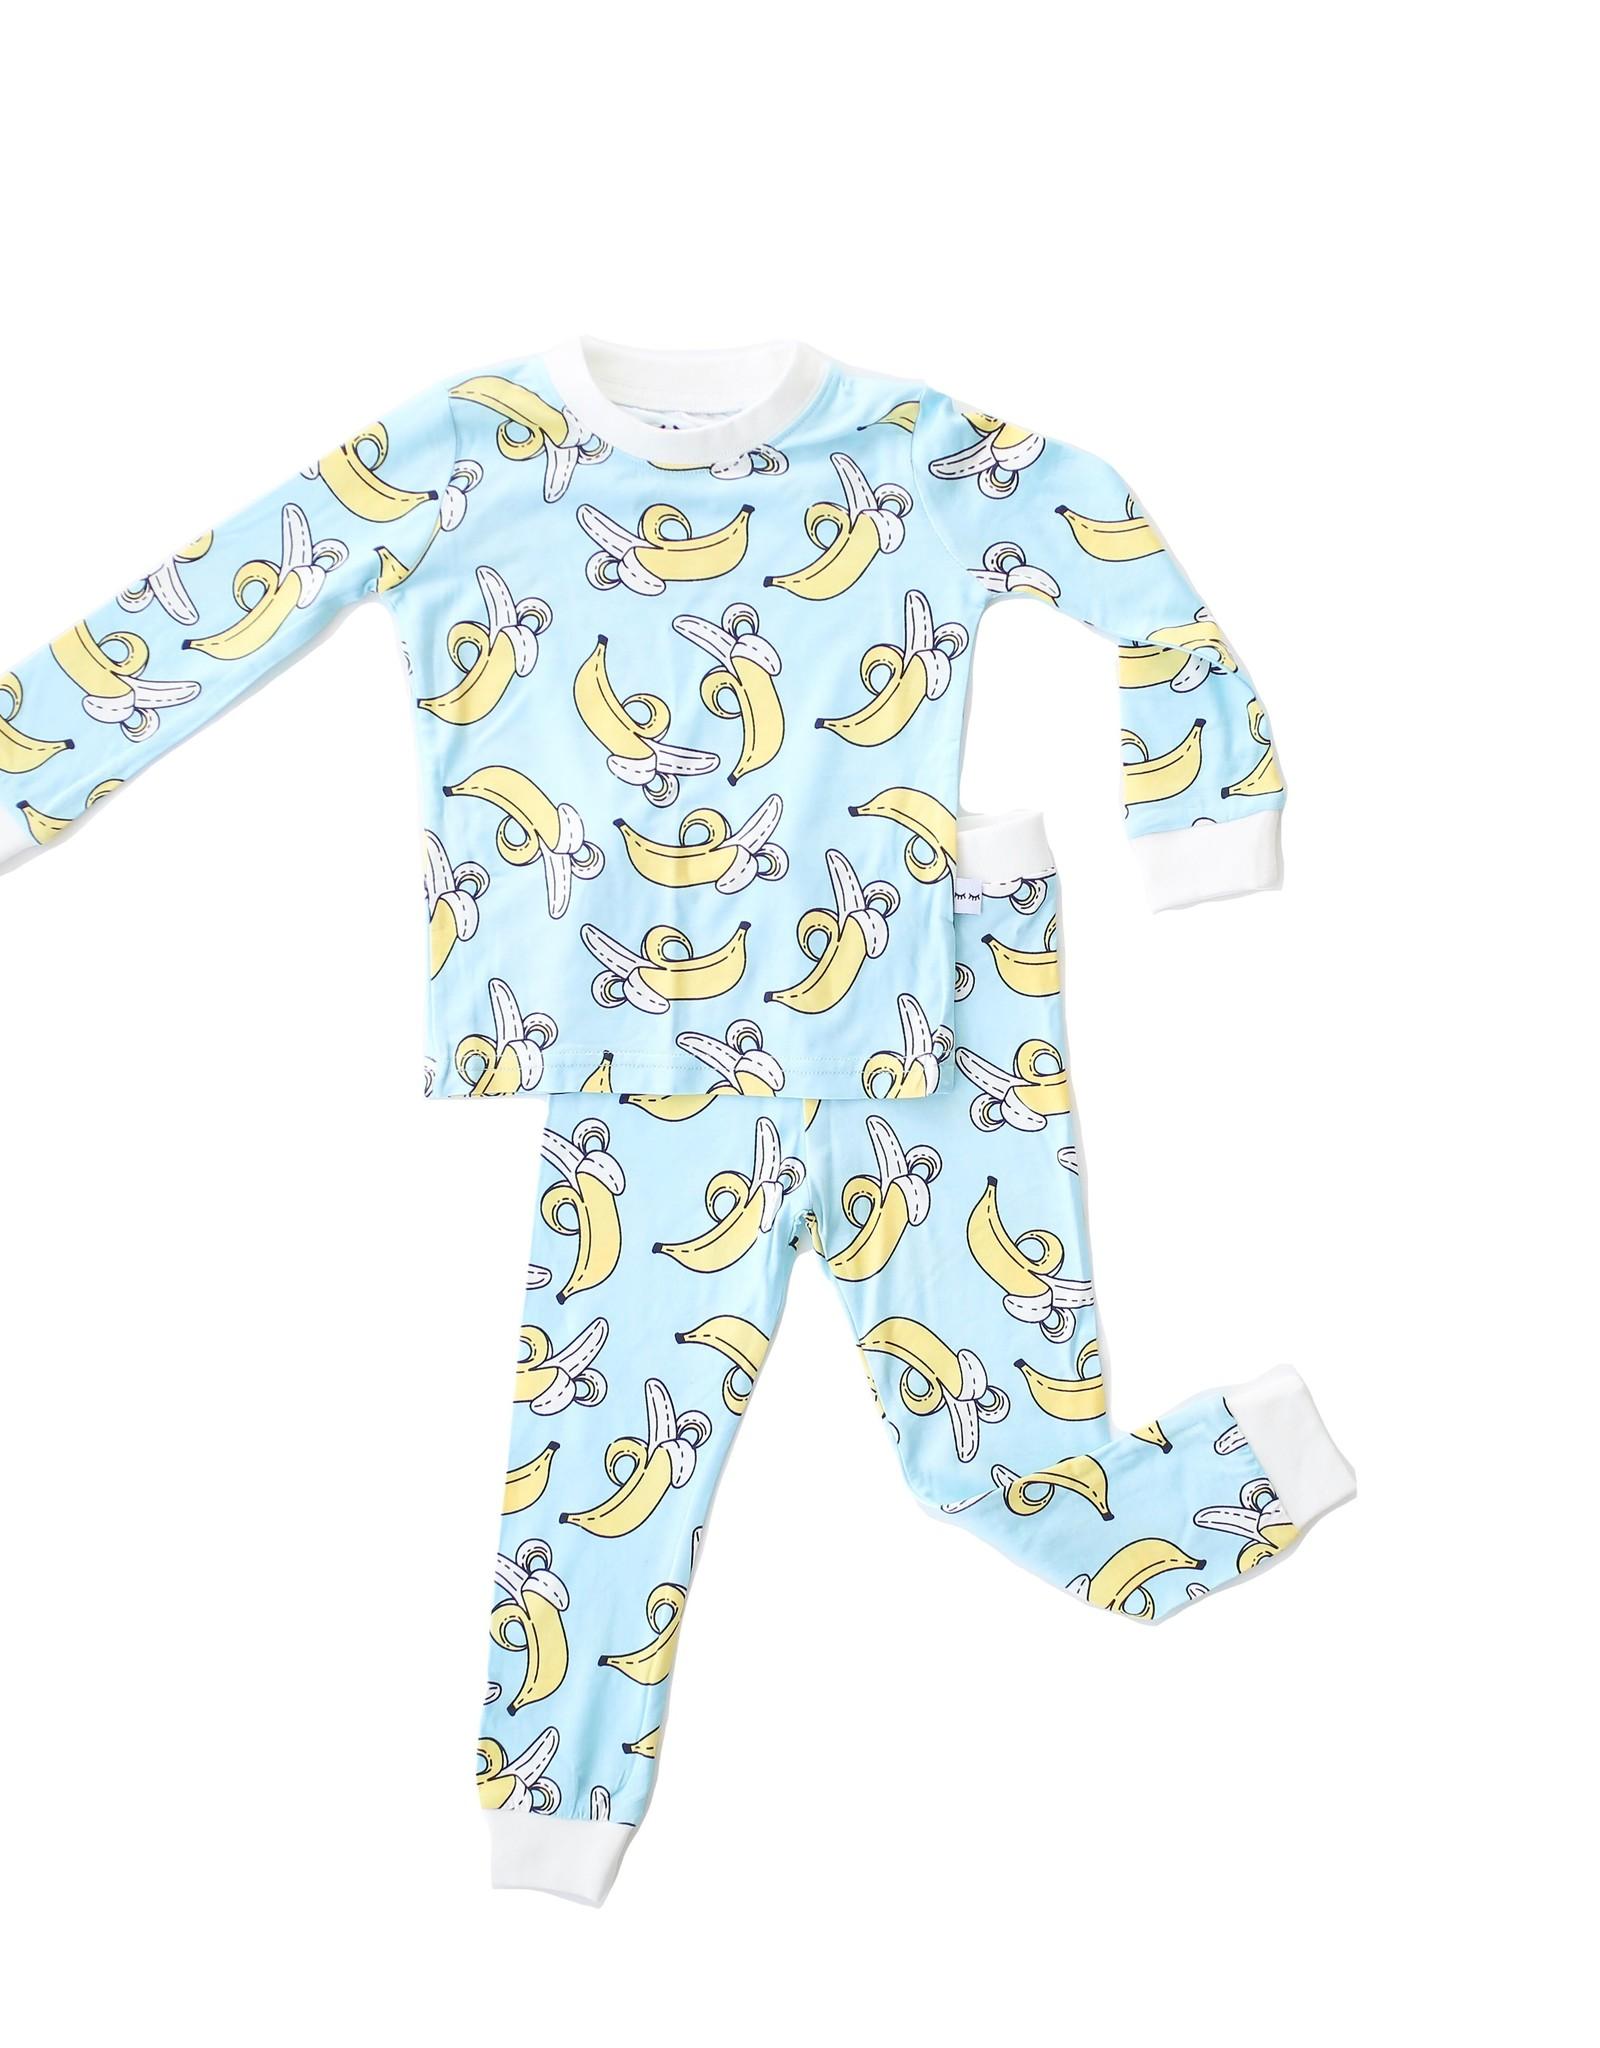 Little Sleepies bananas pajamas